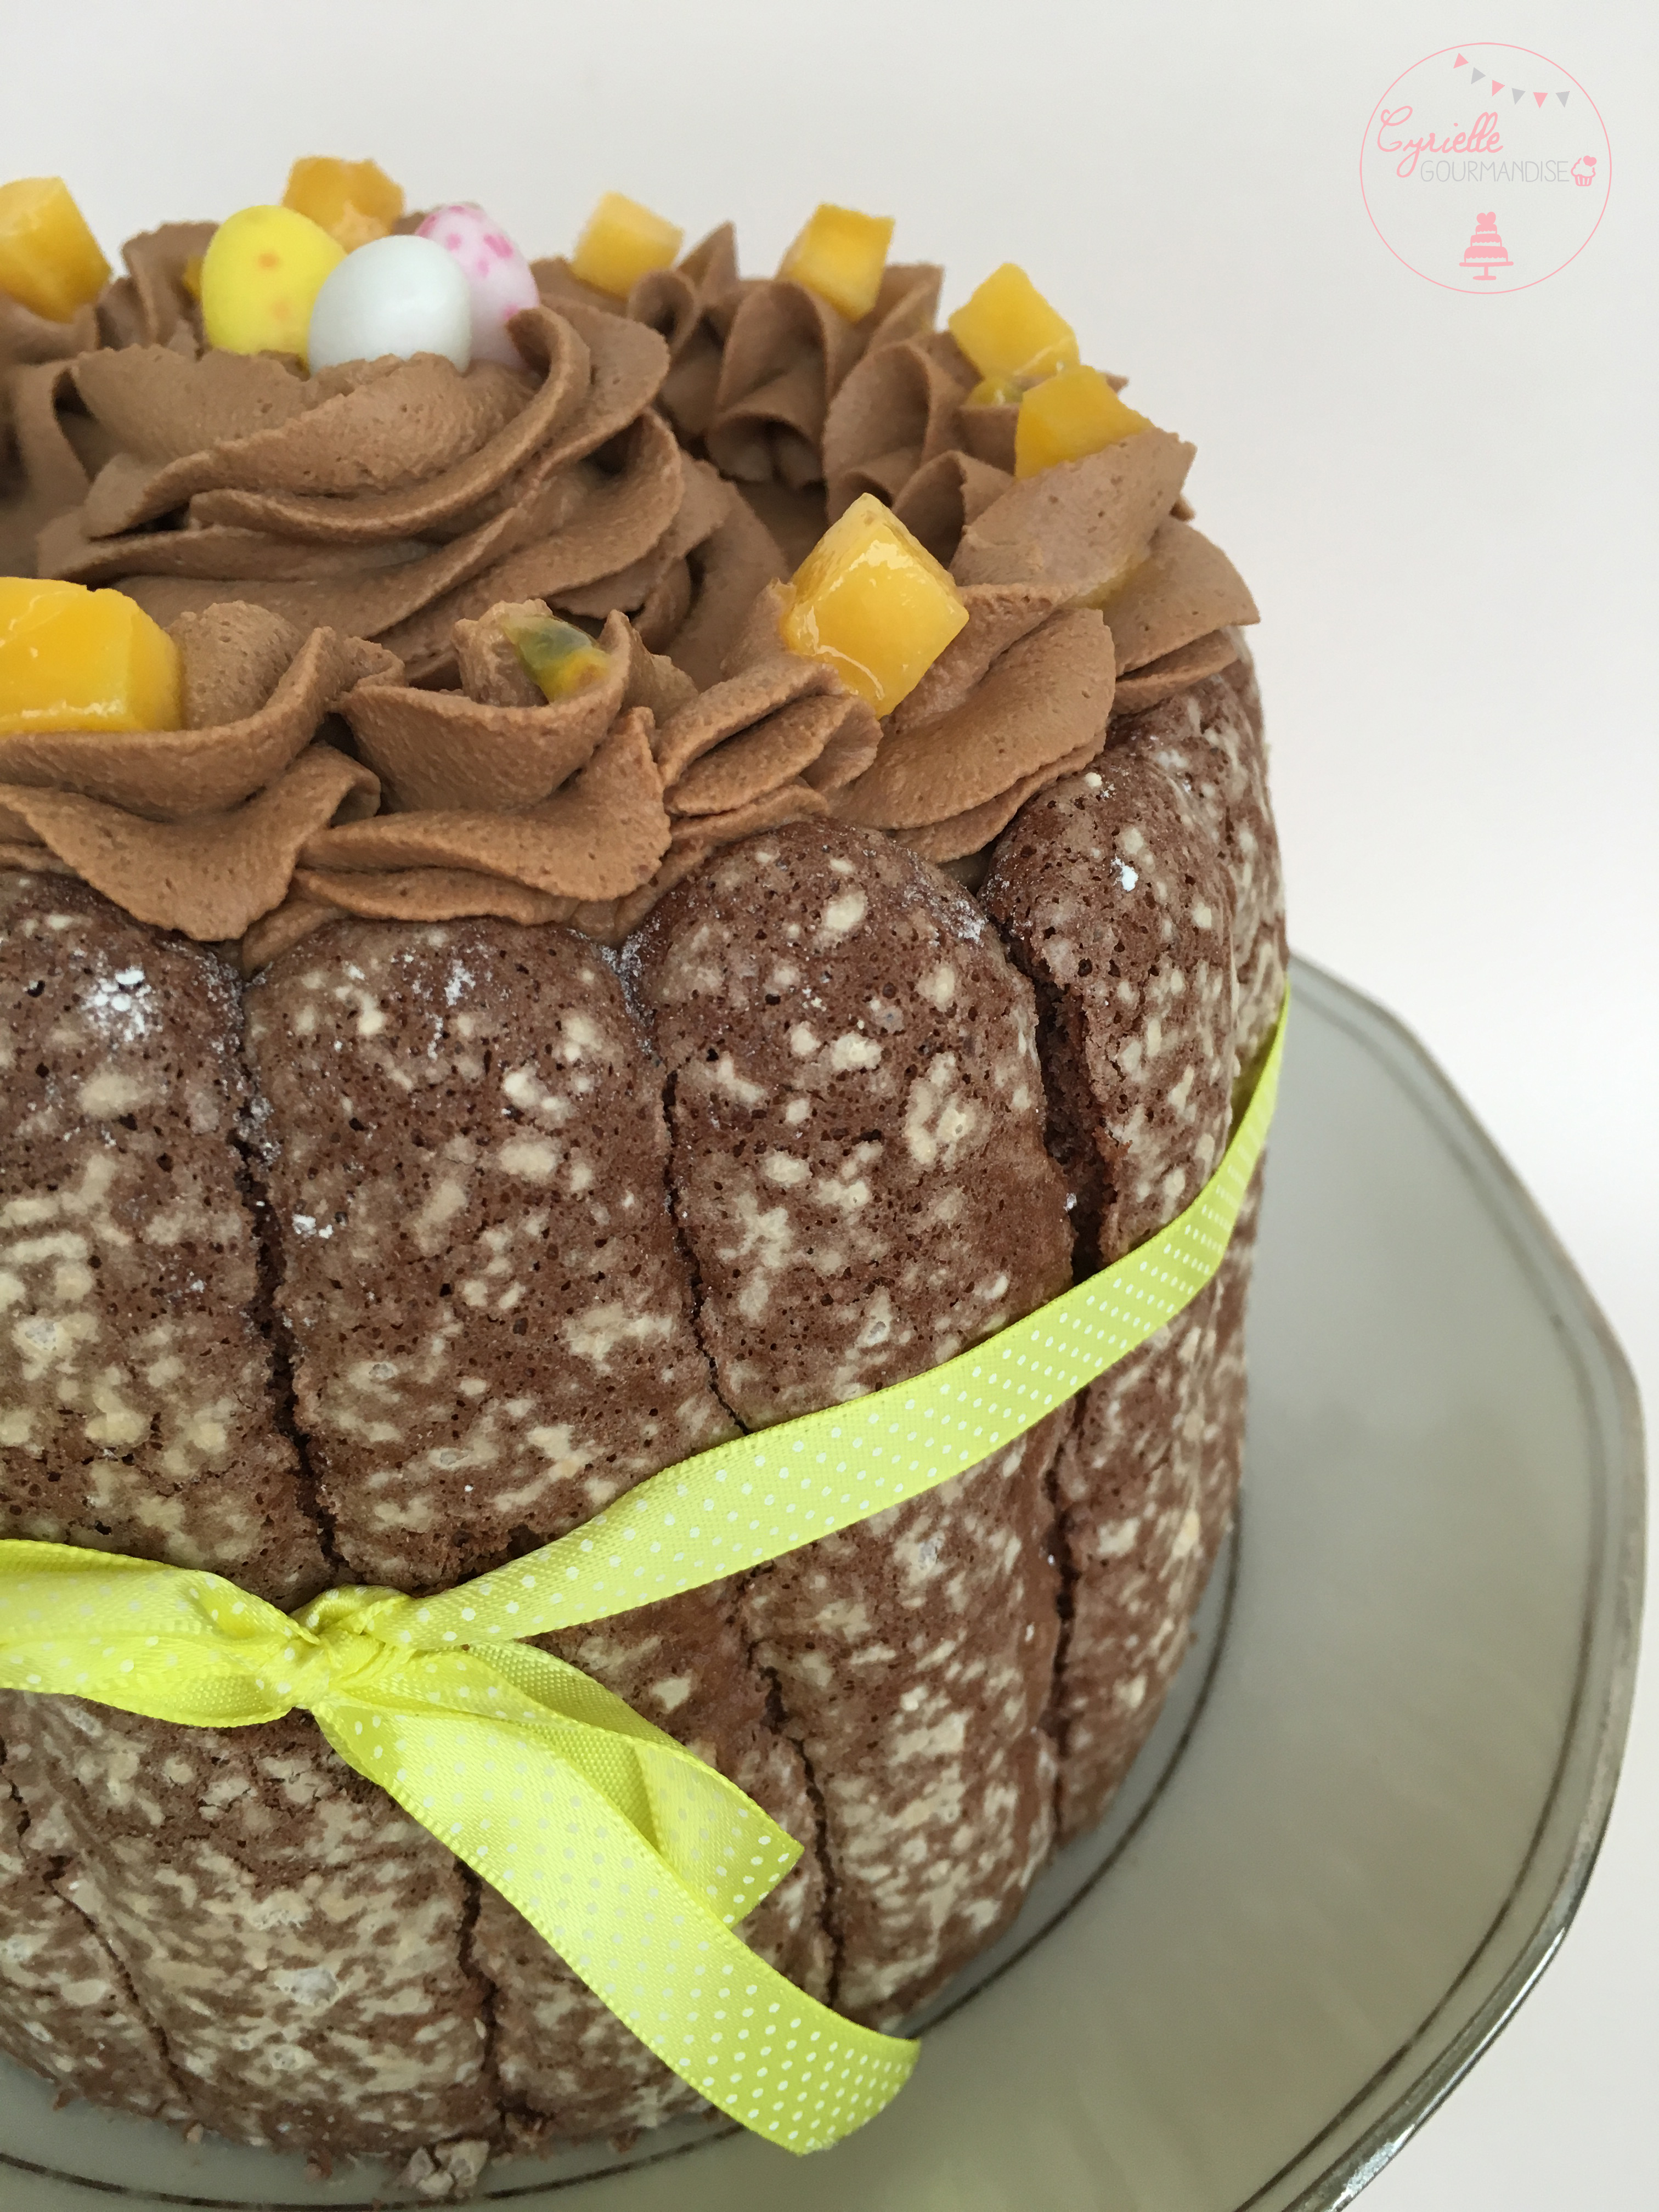 Charlotte chocolat mangue passion